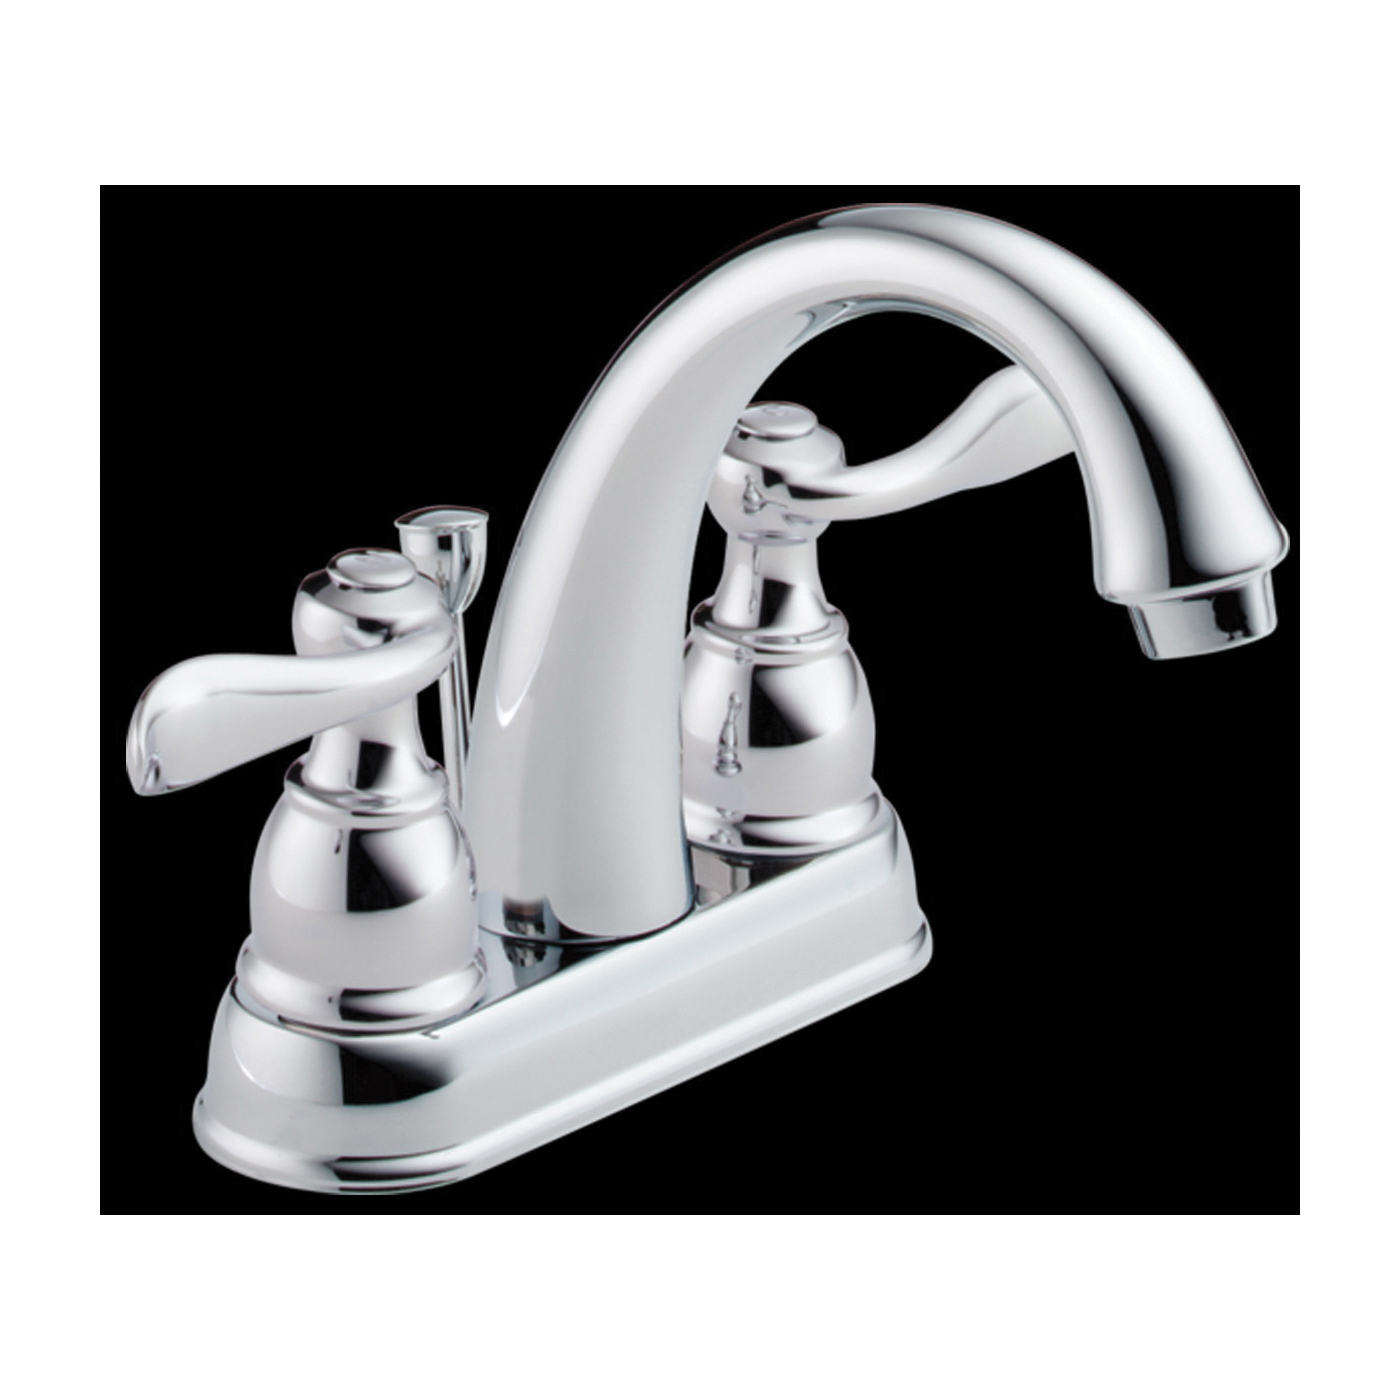 Picture of DELTA Windemere 25996LF-ECO Bathroom Faucet, 1.2 gpm, 2-Faucet Handle, Chrome, Lever Handle, High-Arc Spout